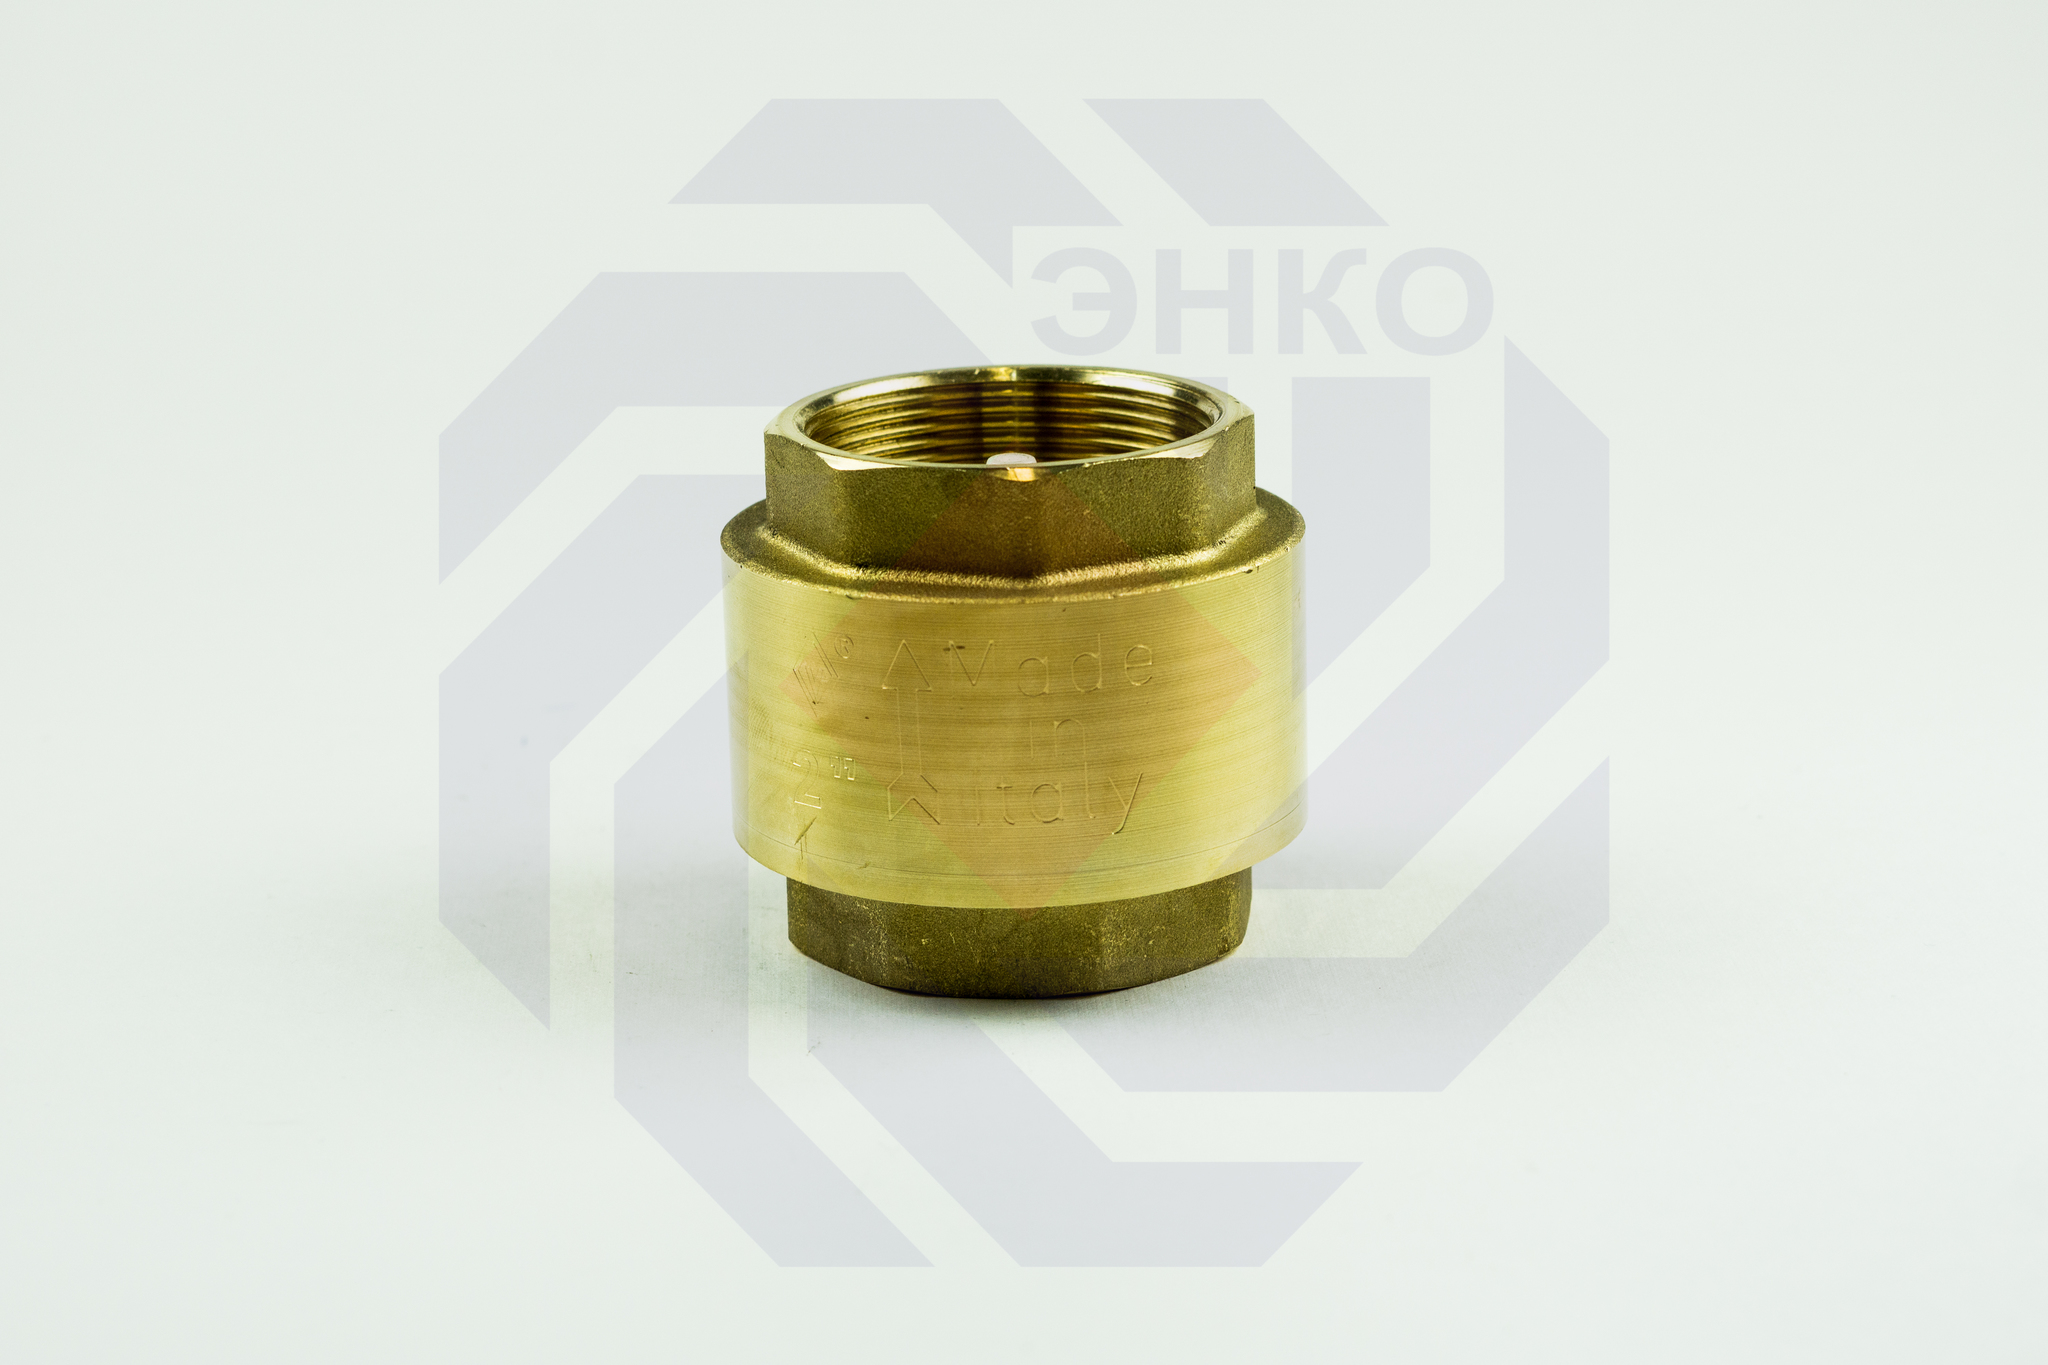 Клапан обратный ВР/ВР BUGATTI EURO 1000 2½